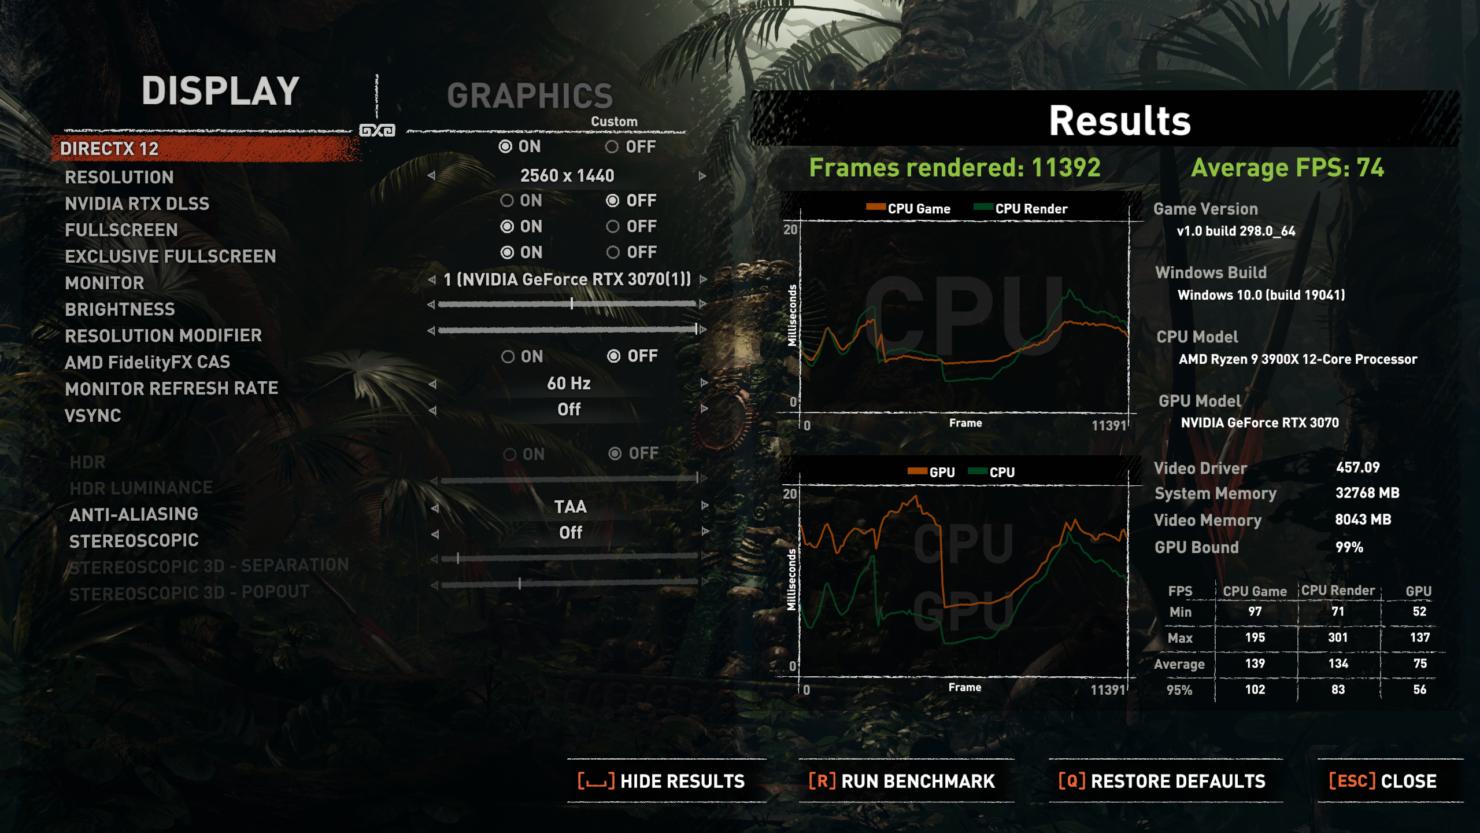 nvidia-geforce-rtx-3070-raytracing-benchmark_wqhd_dlss-off